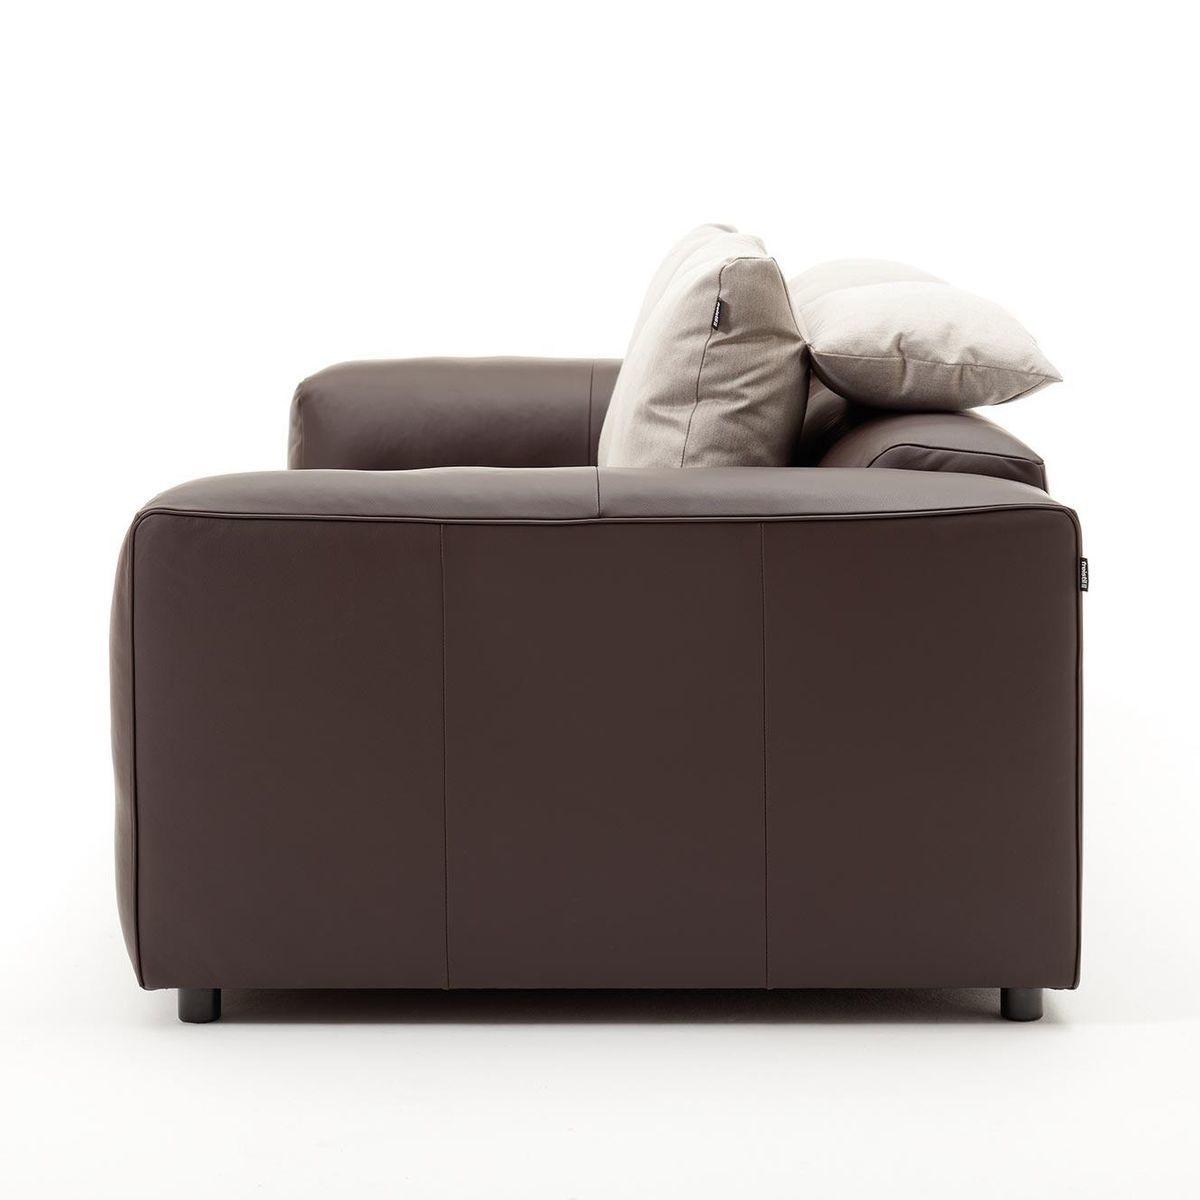 freistil 187 canap de cuir 3 places freistil rolf benz. Black Bedroom Furniture Sets. Home Design Ideas